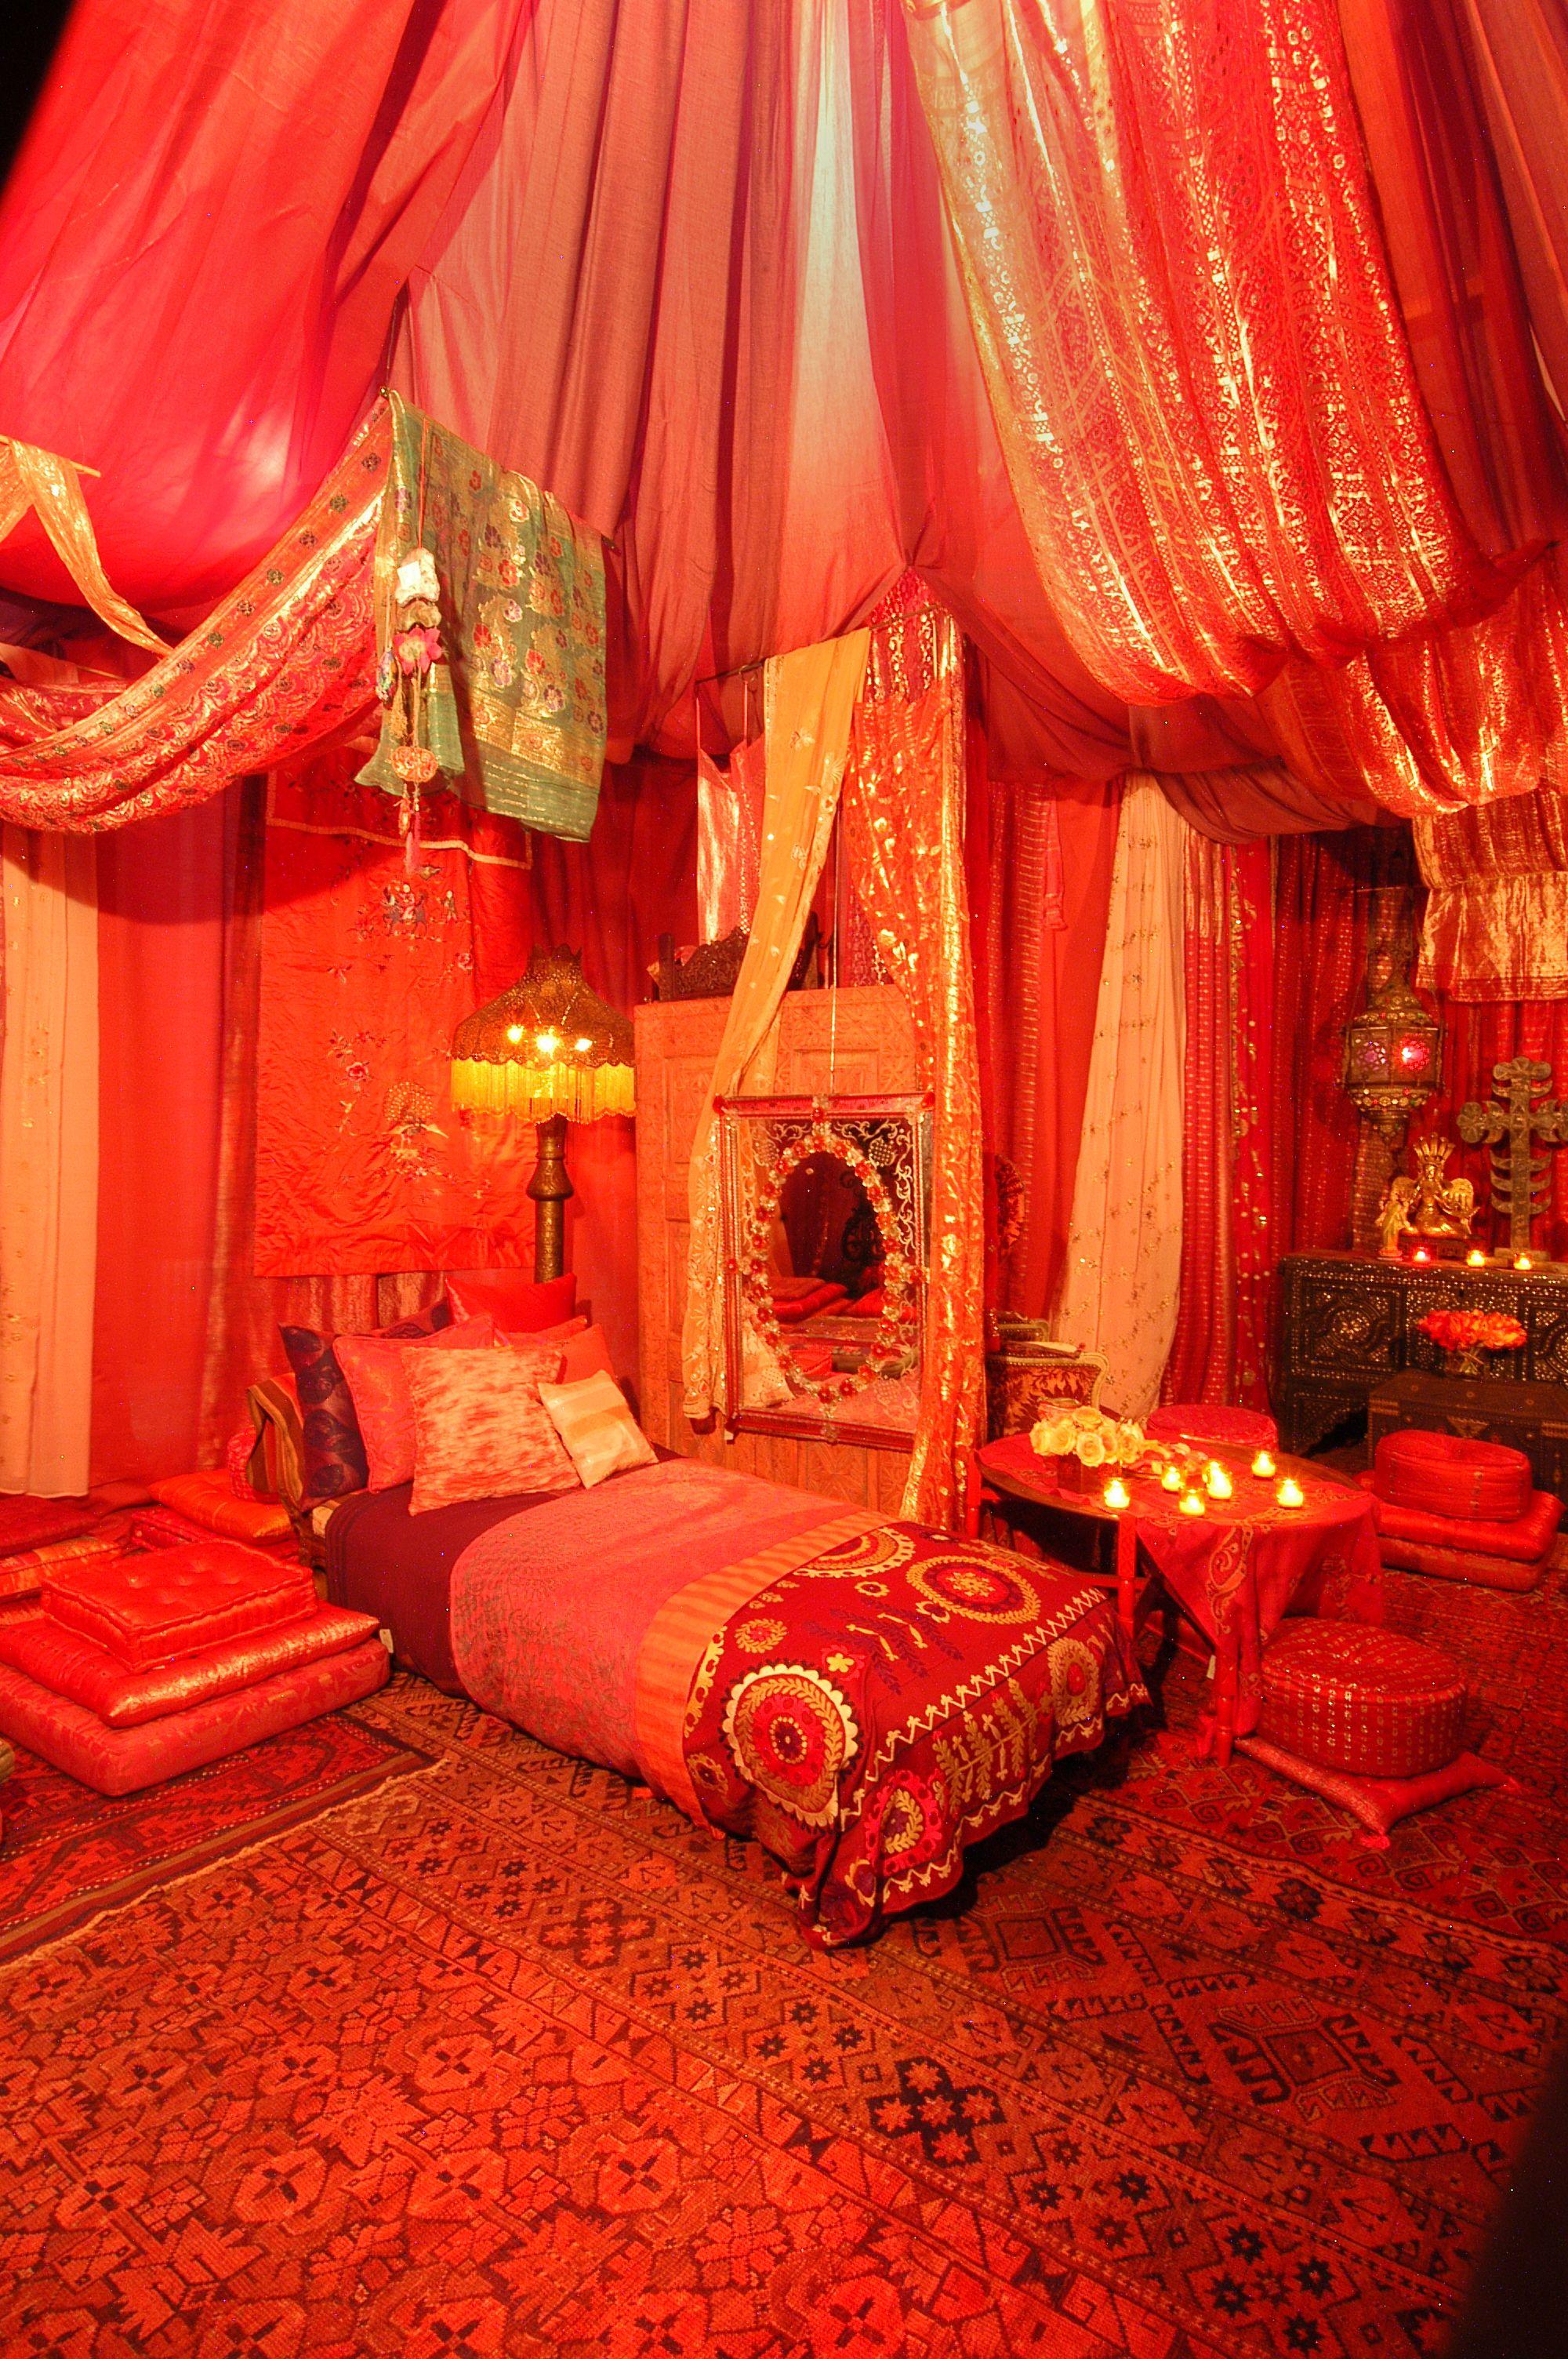 ABC Carpet u0026 Home Store Red Tent ... & ABC Carpet u0026 Home Store Red Tent 2005   Red Tent Movie ...